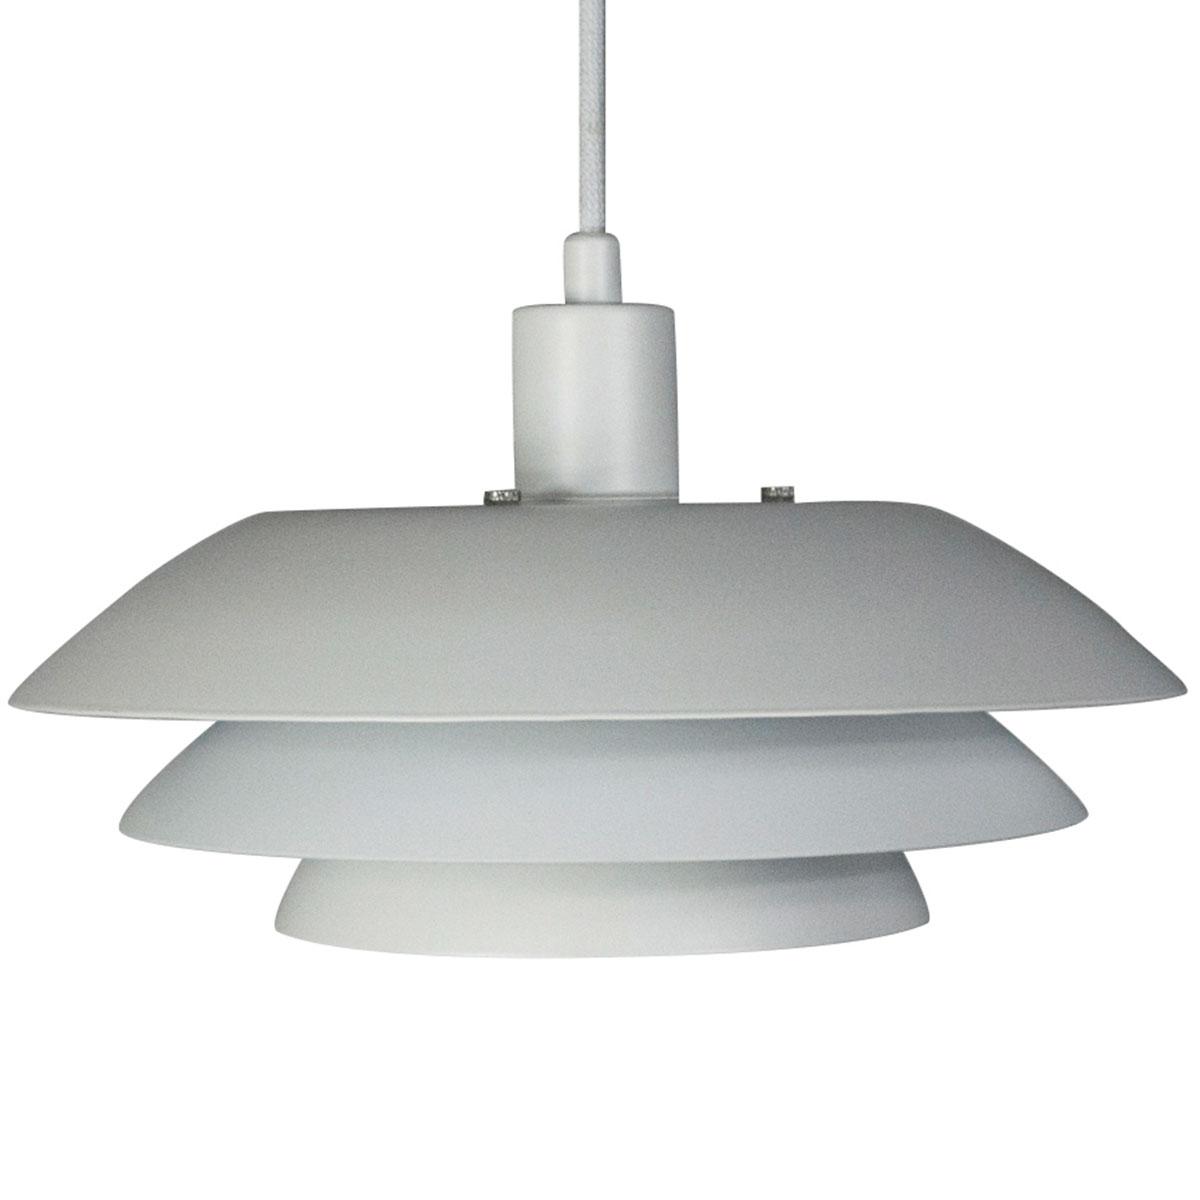 Image of   DybergLarsen pendel - DL31 - Hvid